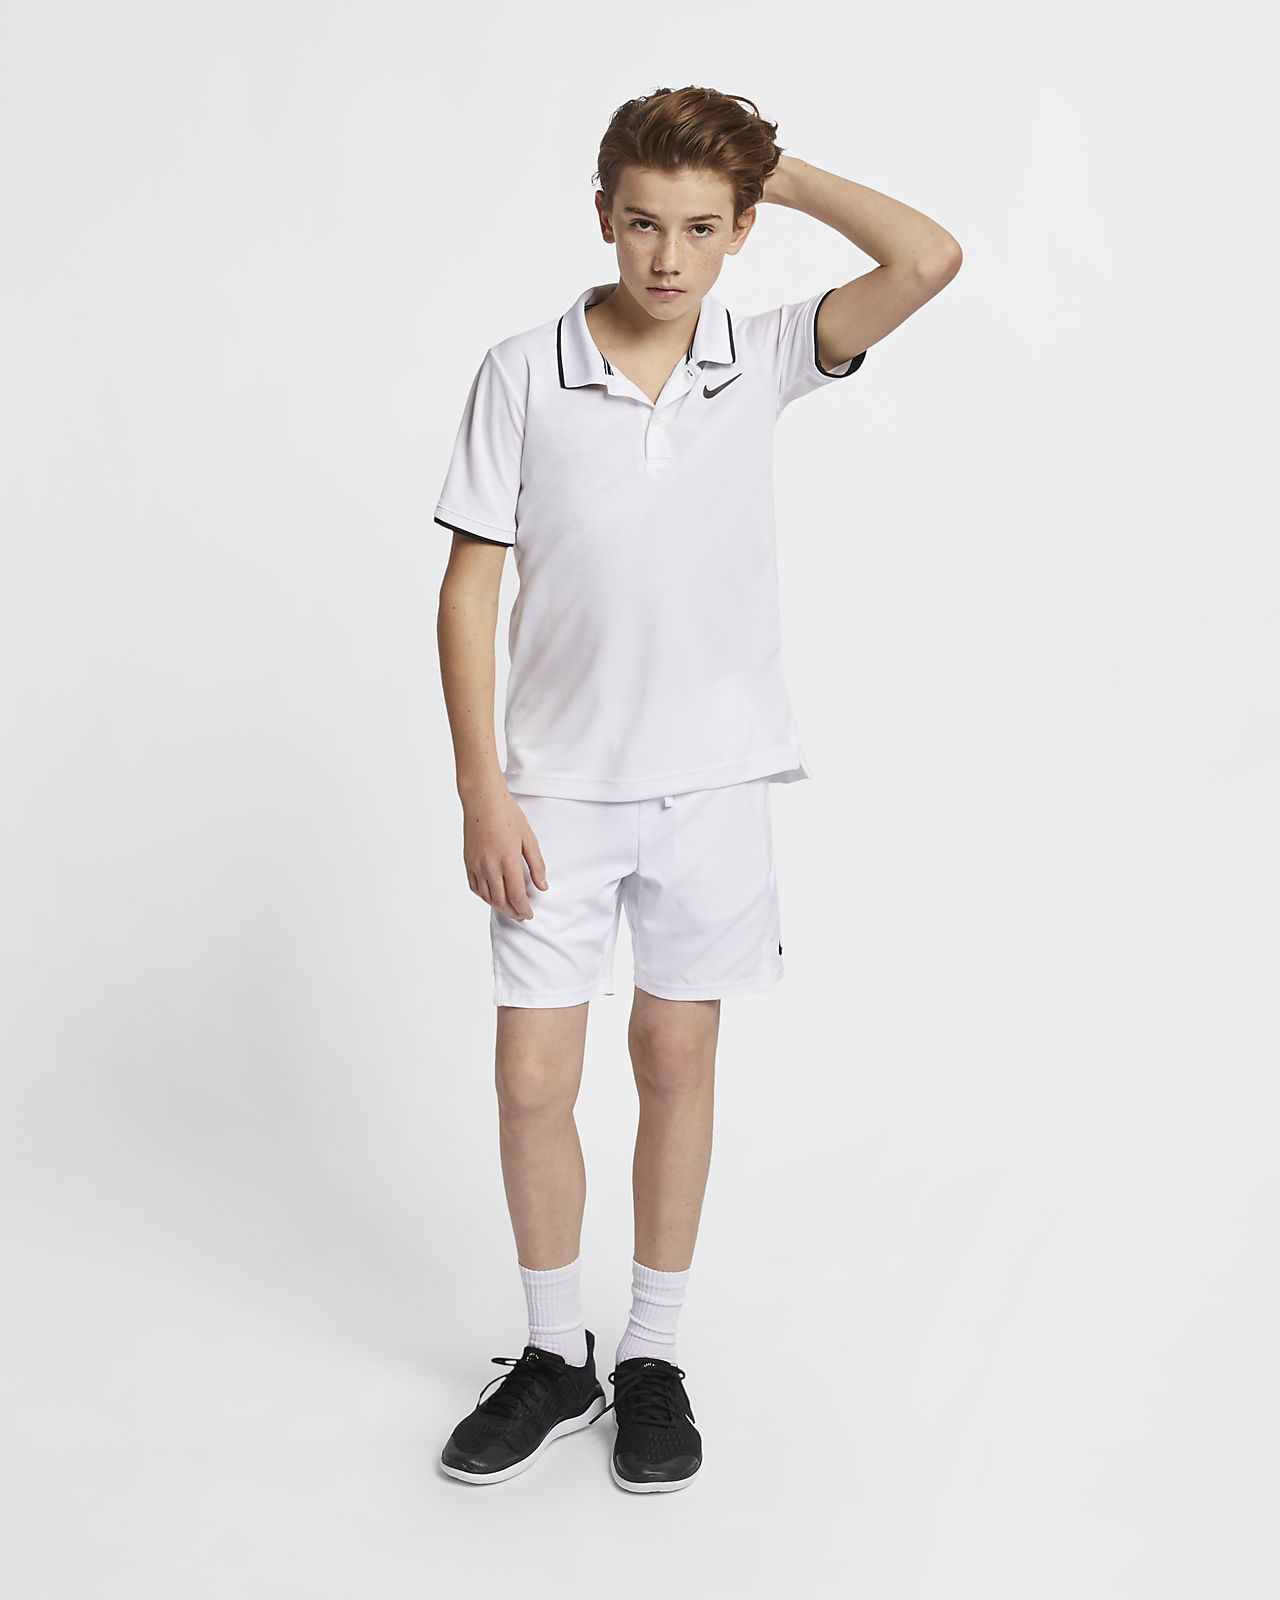 66a521f1 NikeCourt Dri-FIT Older Kids' (Boys') Tennis Polo. Nike.com AU